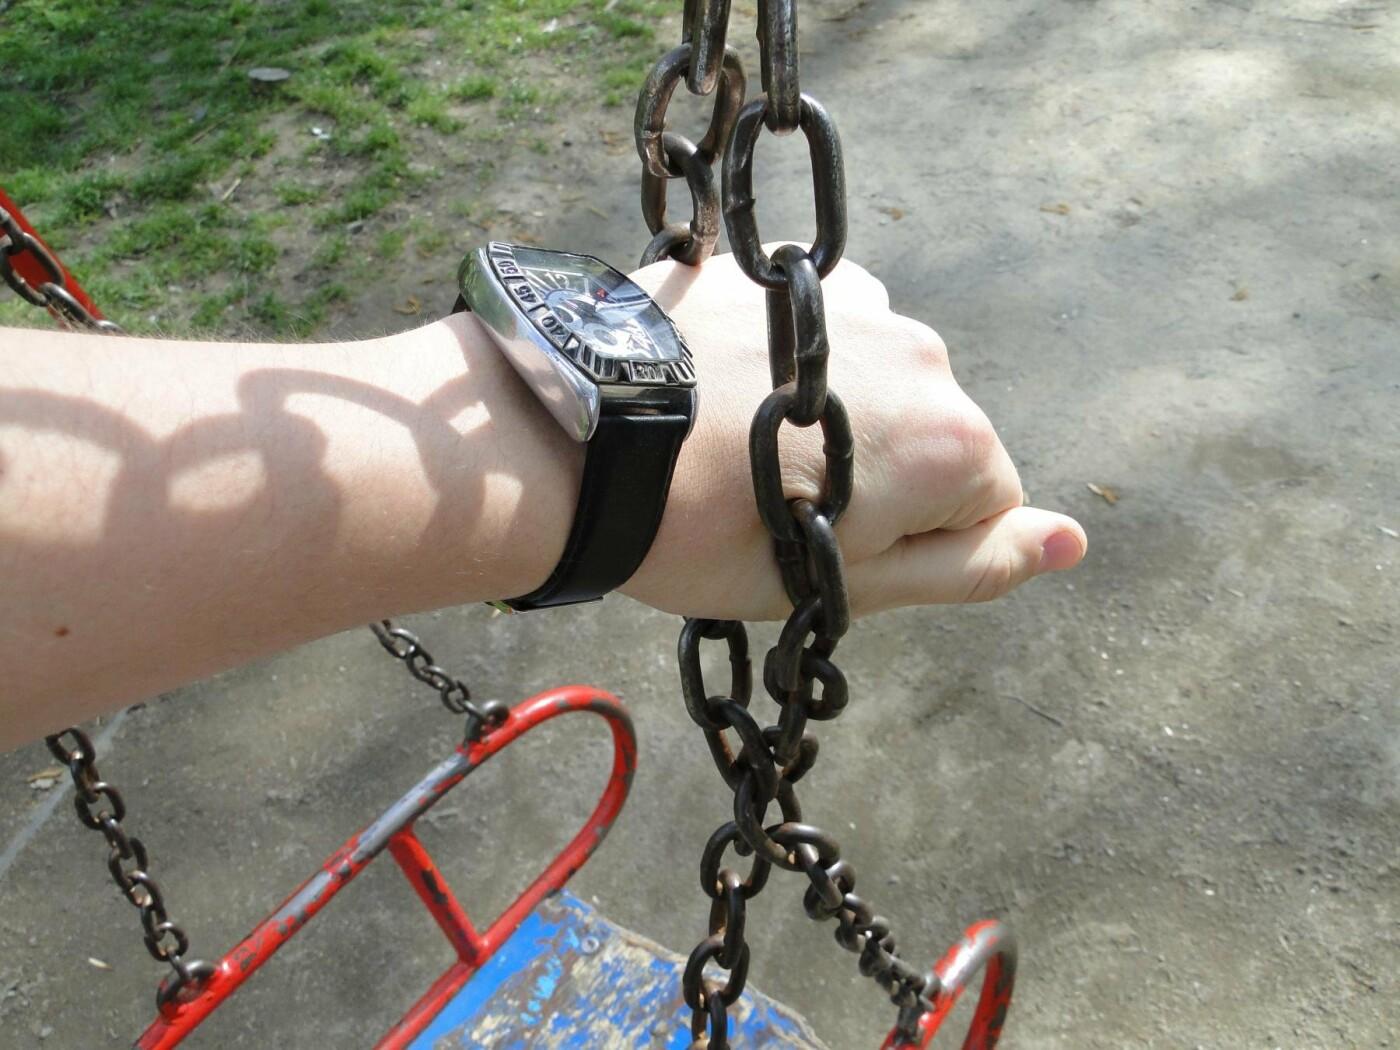 Травмоване дитинство: де зачаїлася небезпека на дитячому майданчику в парку Чекмана. ФОТО, фото-8